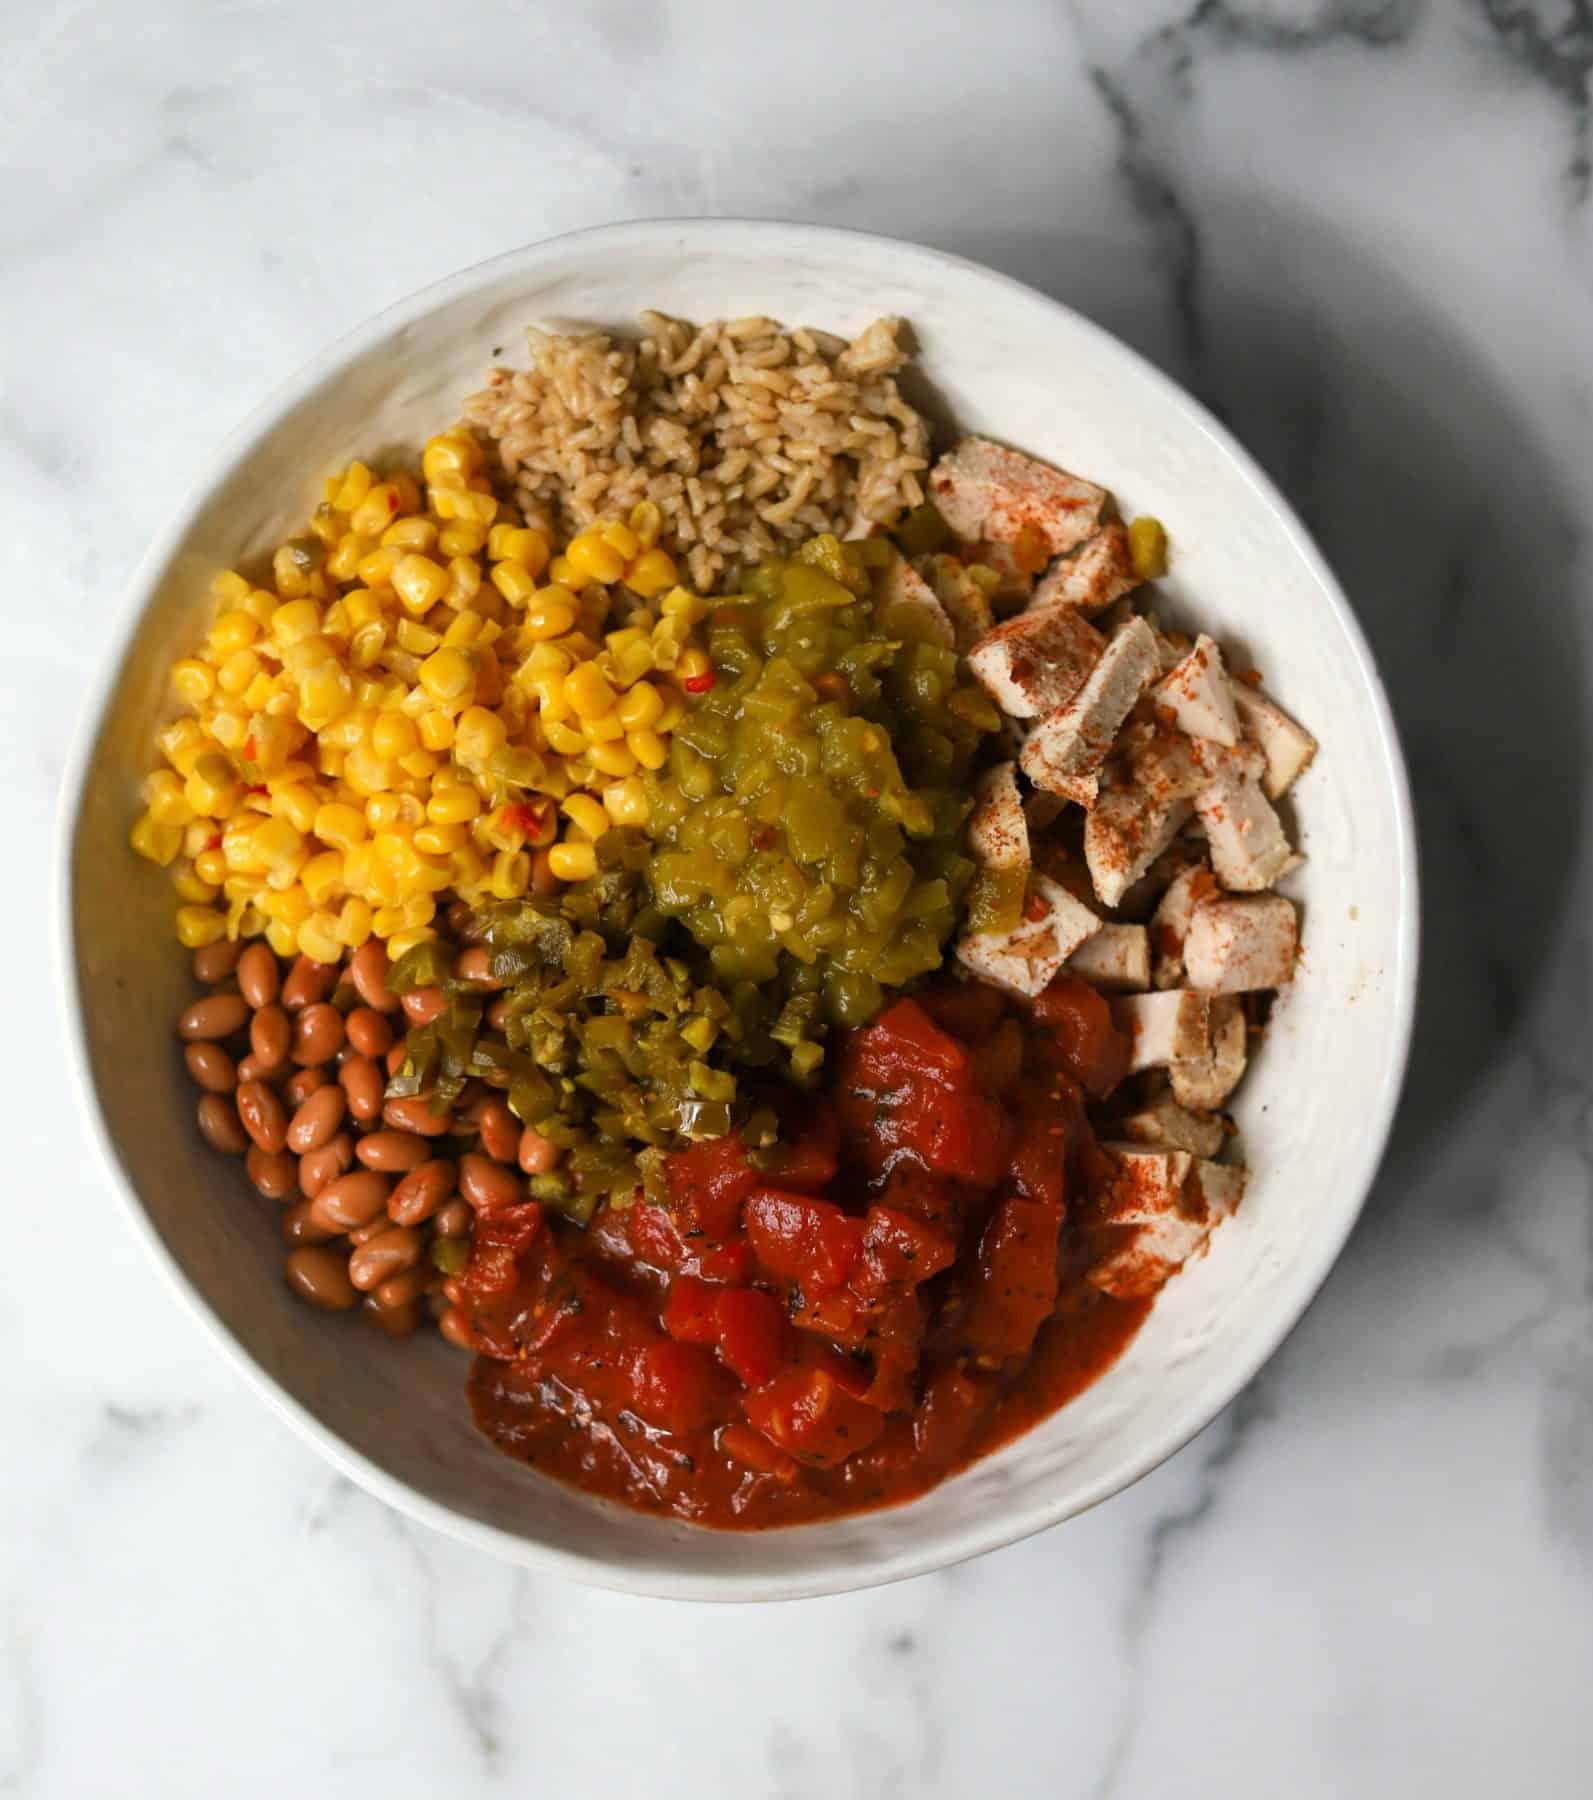 Chicken taco casserole ingredients in a white bowl.